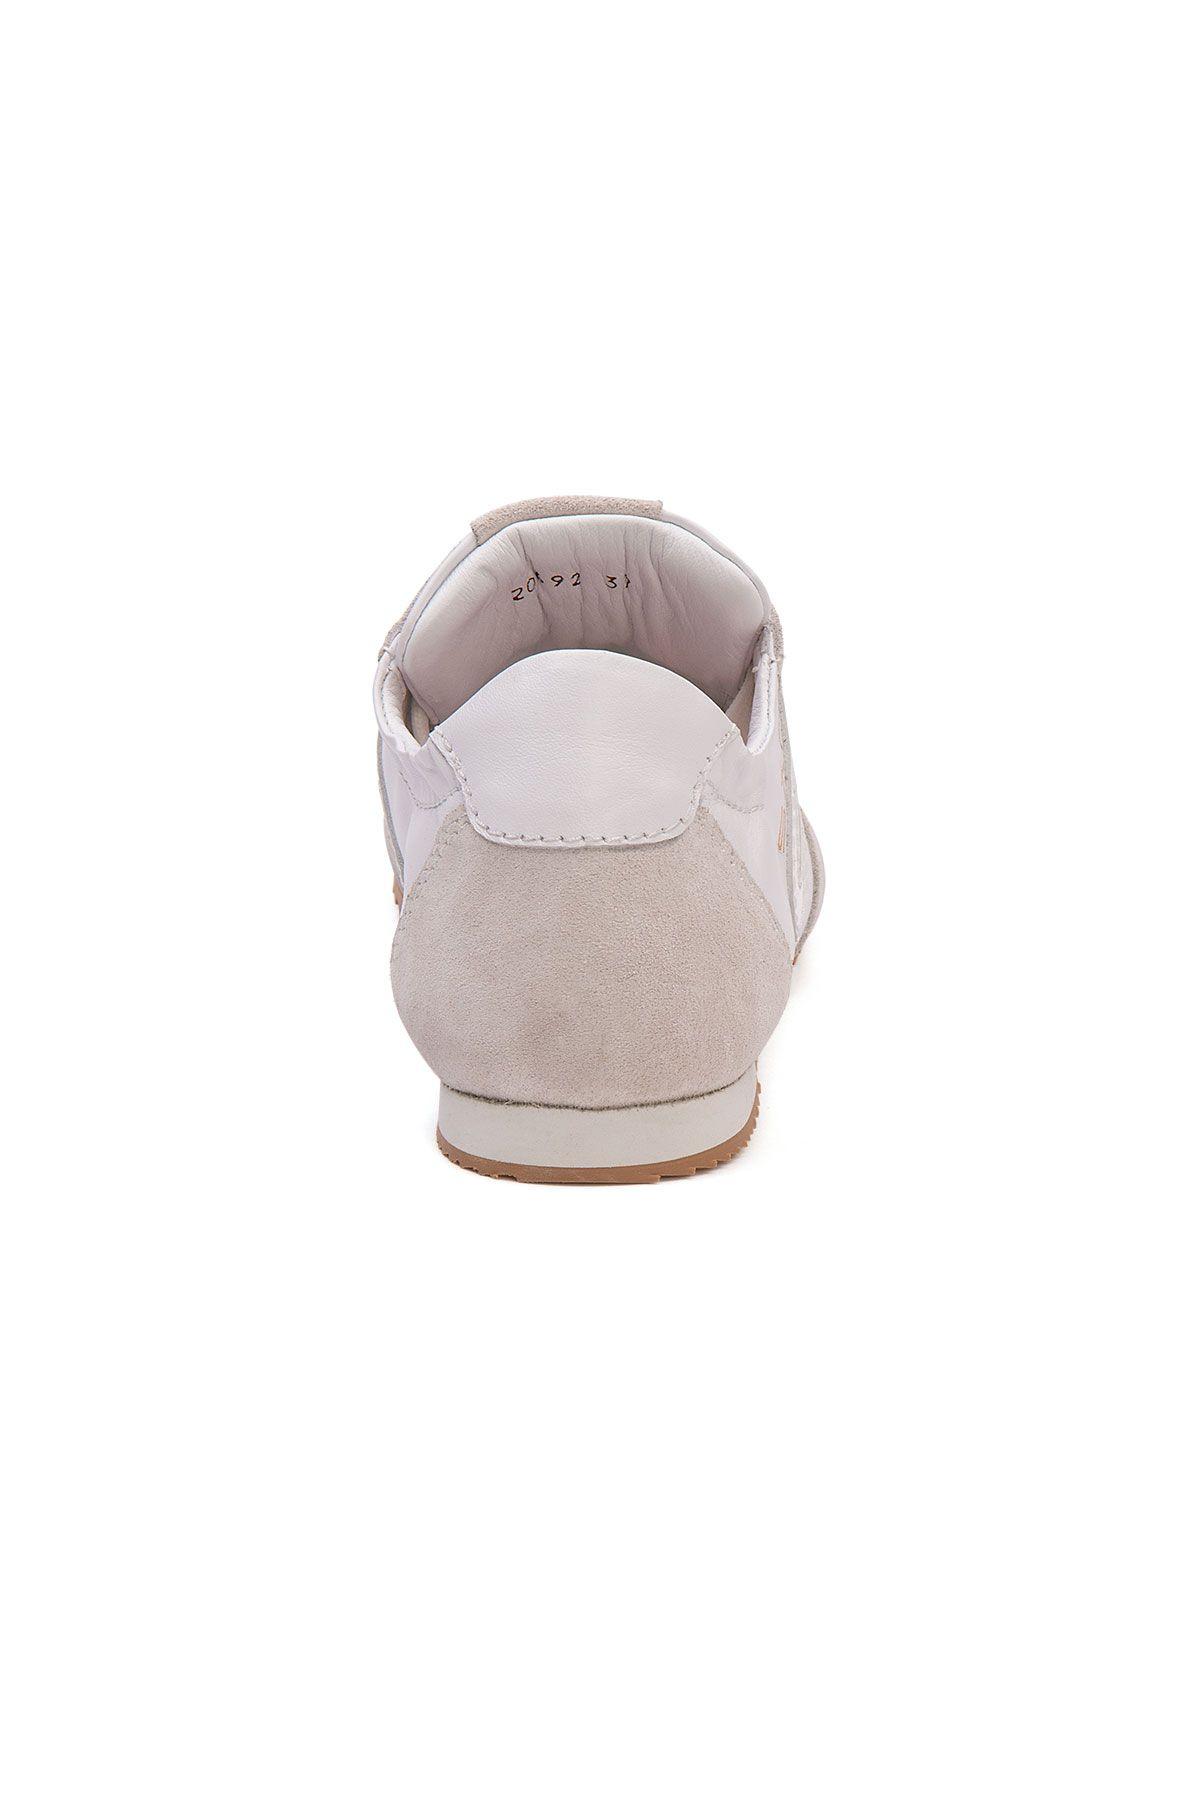 San Women's Leather Sneakers SAN04S White